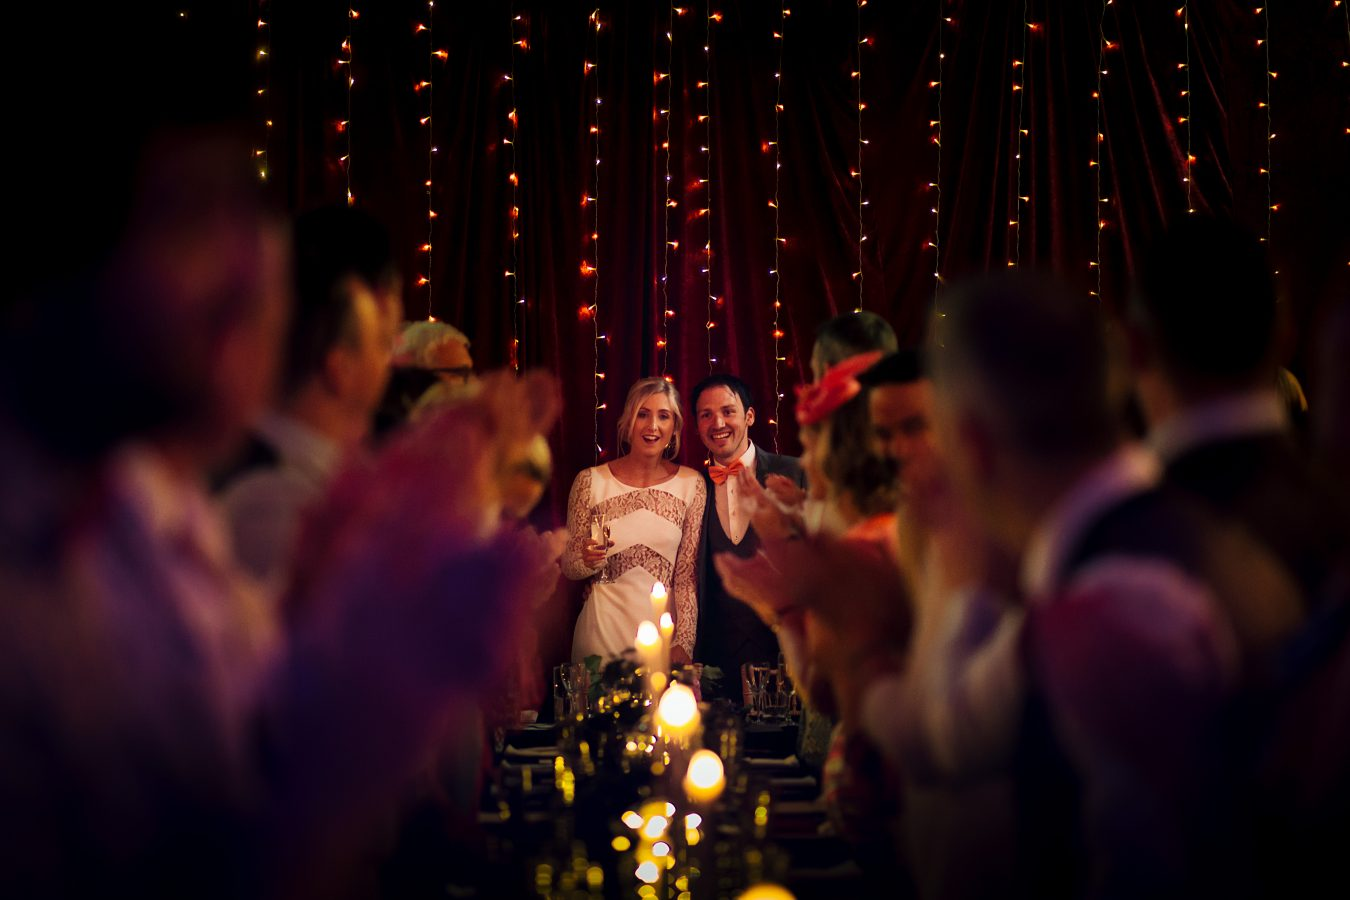 Sarah-Seamy-Jules-Barron-Alternative-Wedding-Venue-2018-630